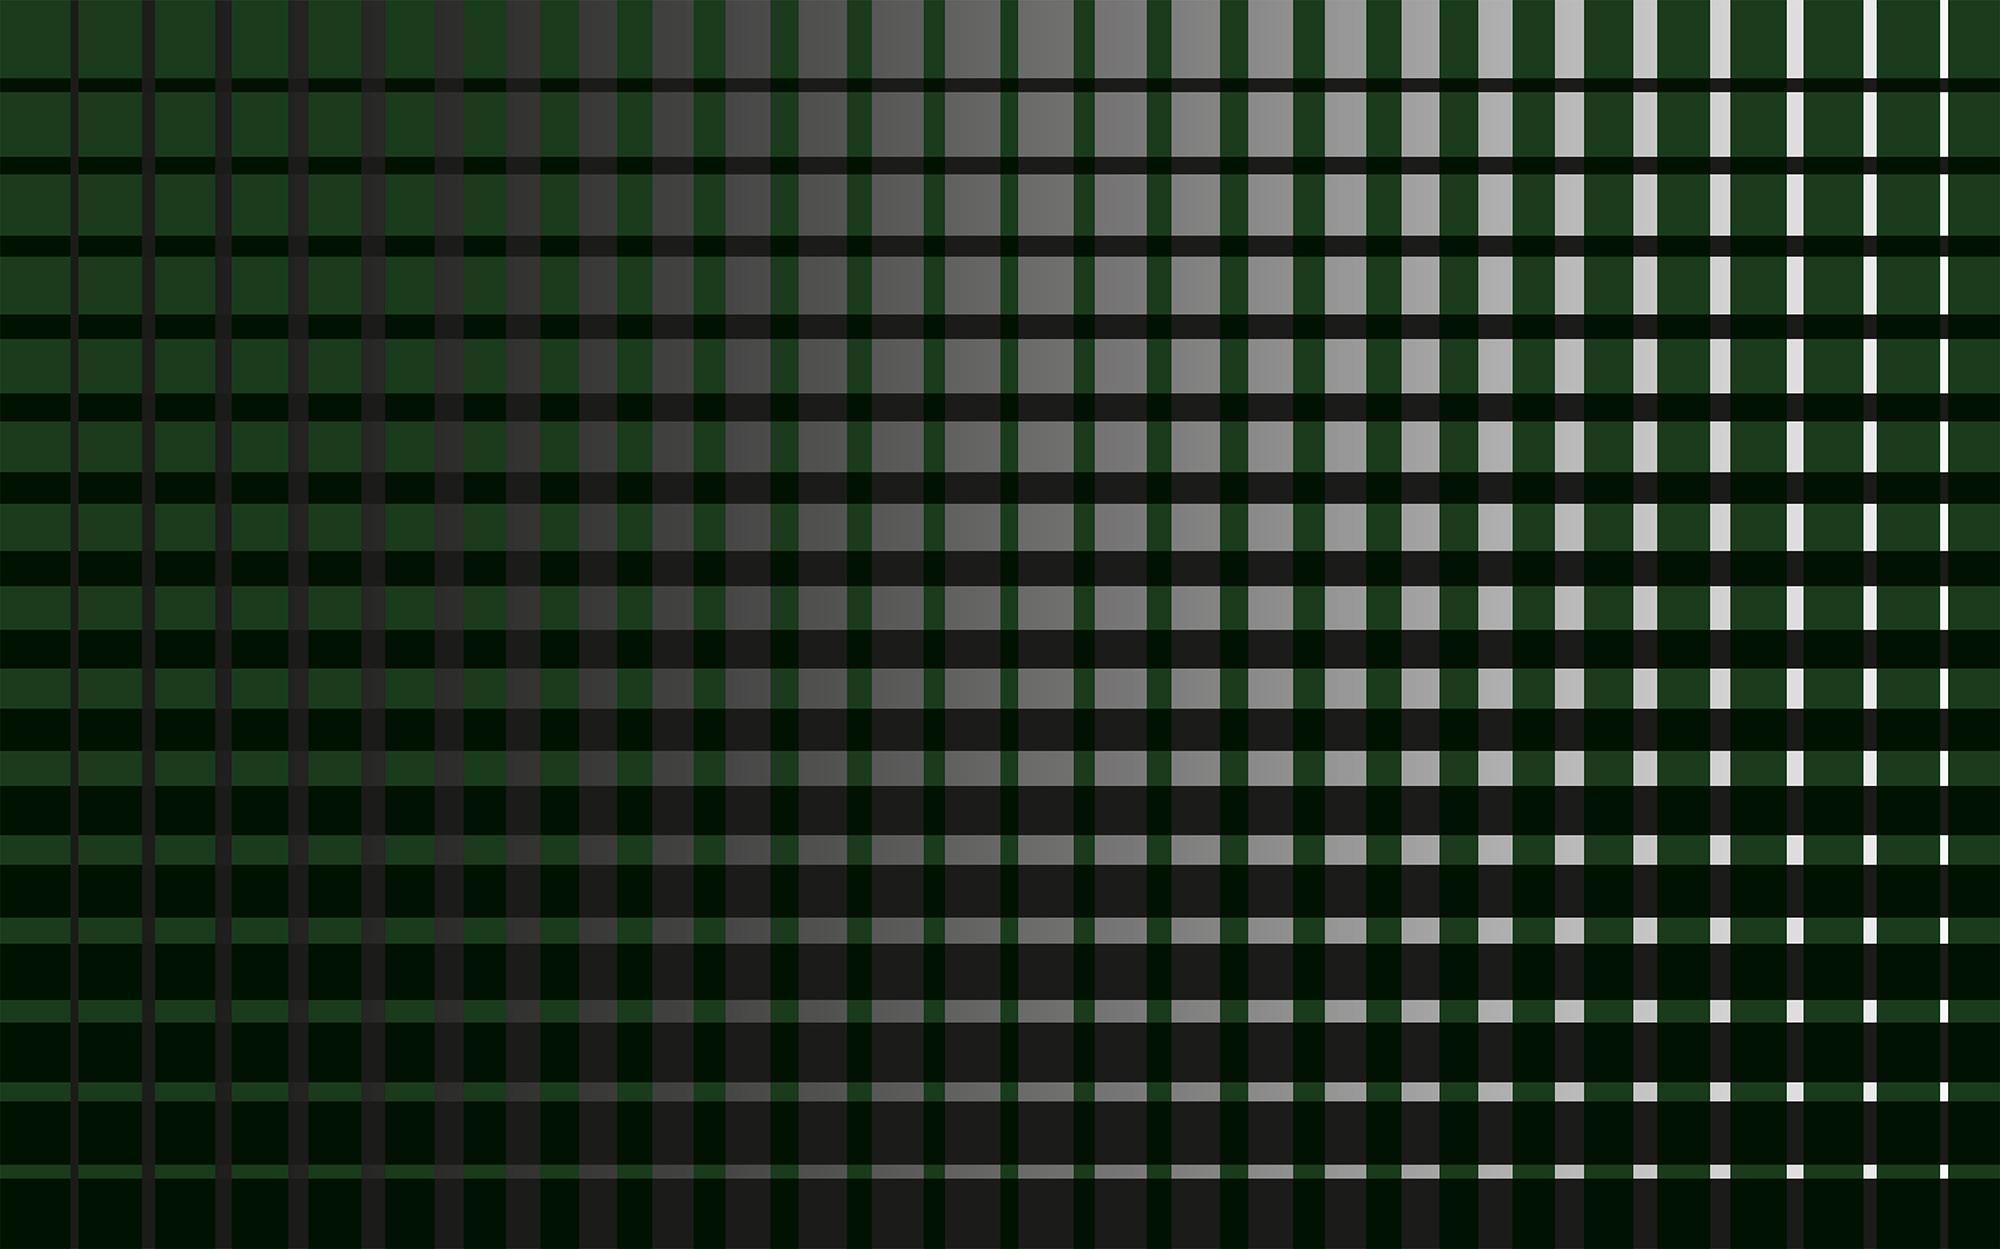 Griddy darkgreenblack-grey